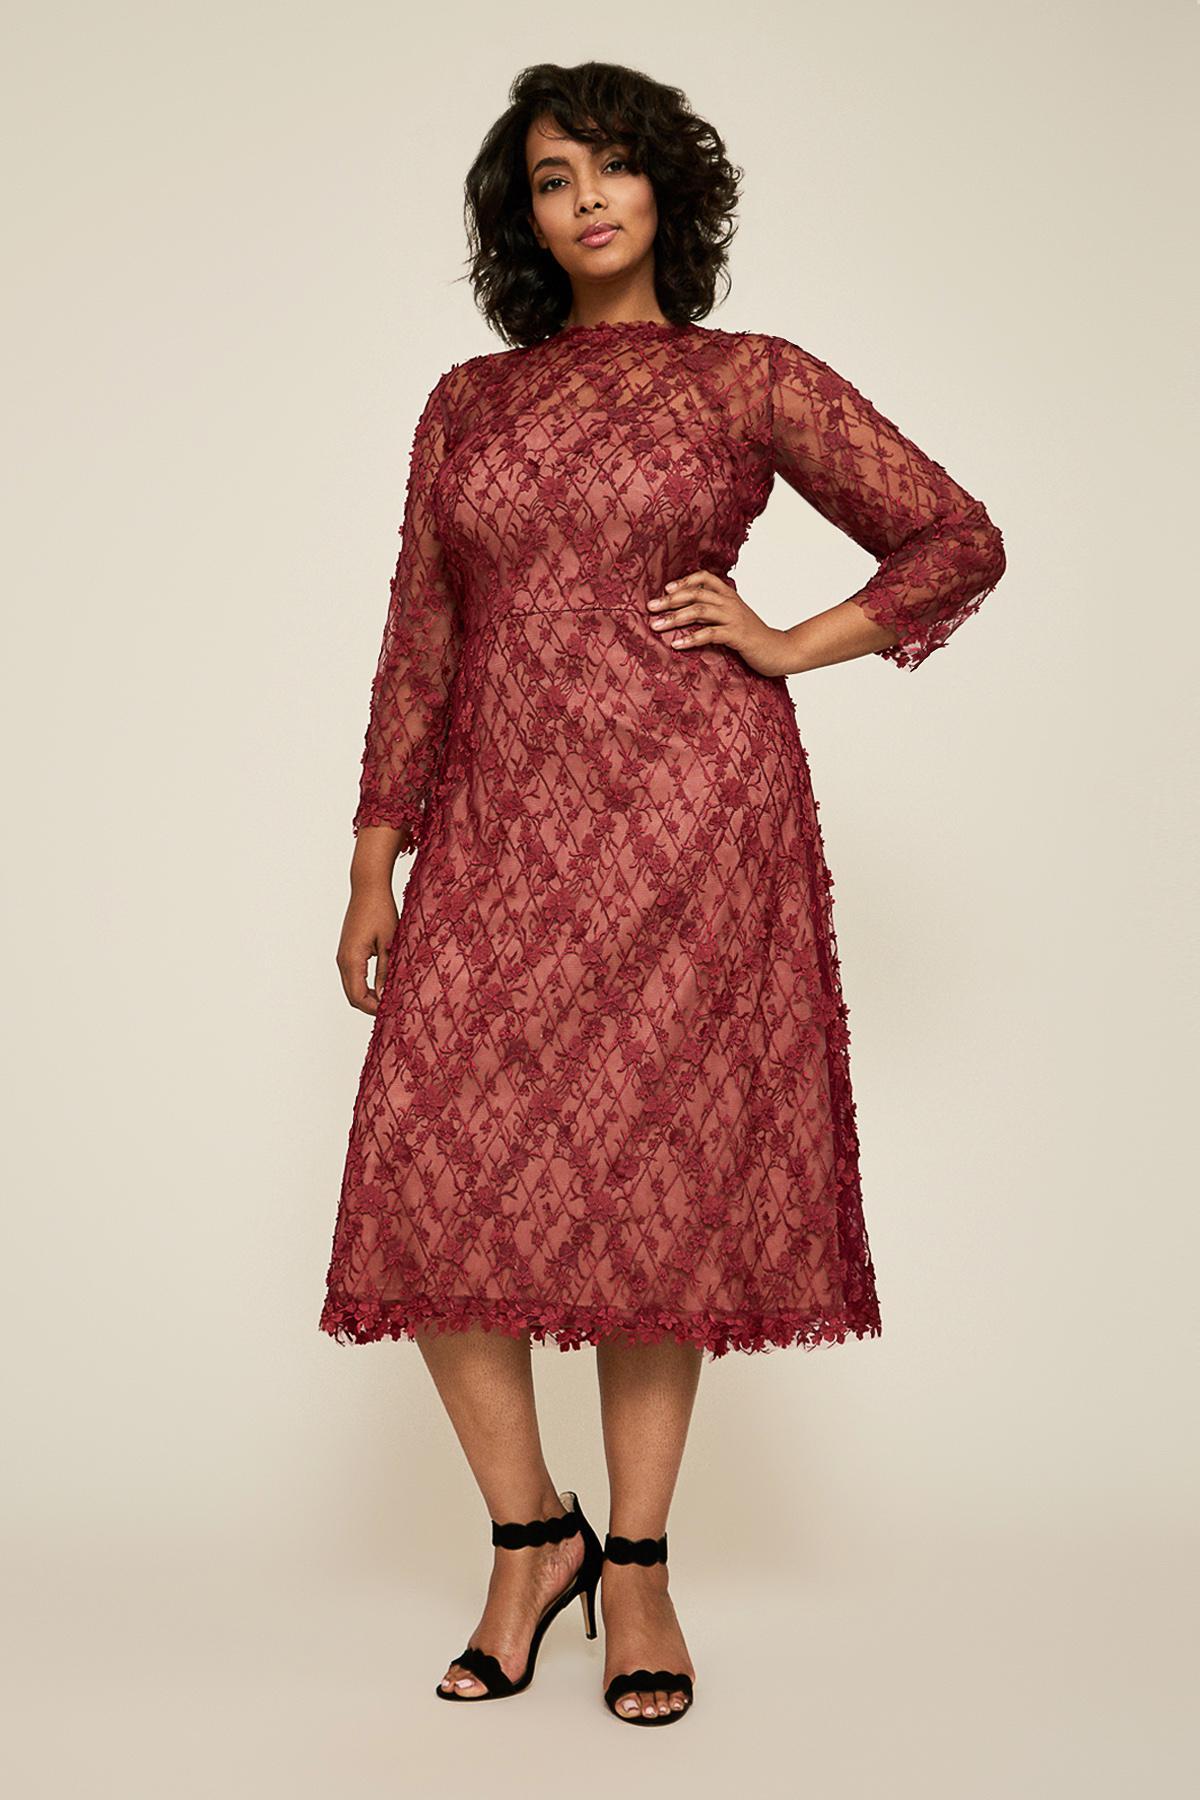 ac562a7aa3d90 Lyst - Tadashi Shoji Binx Embroidery Tea-length Dress - Plus Size in Red